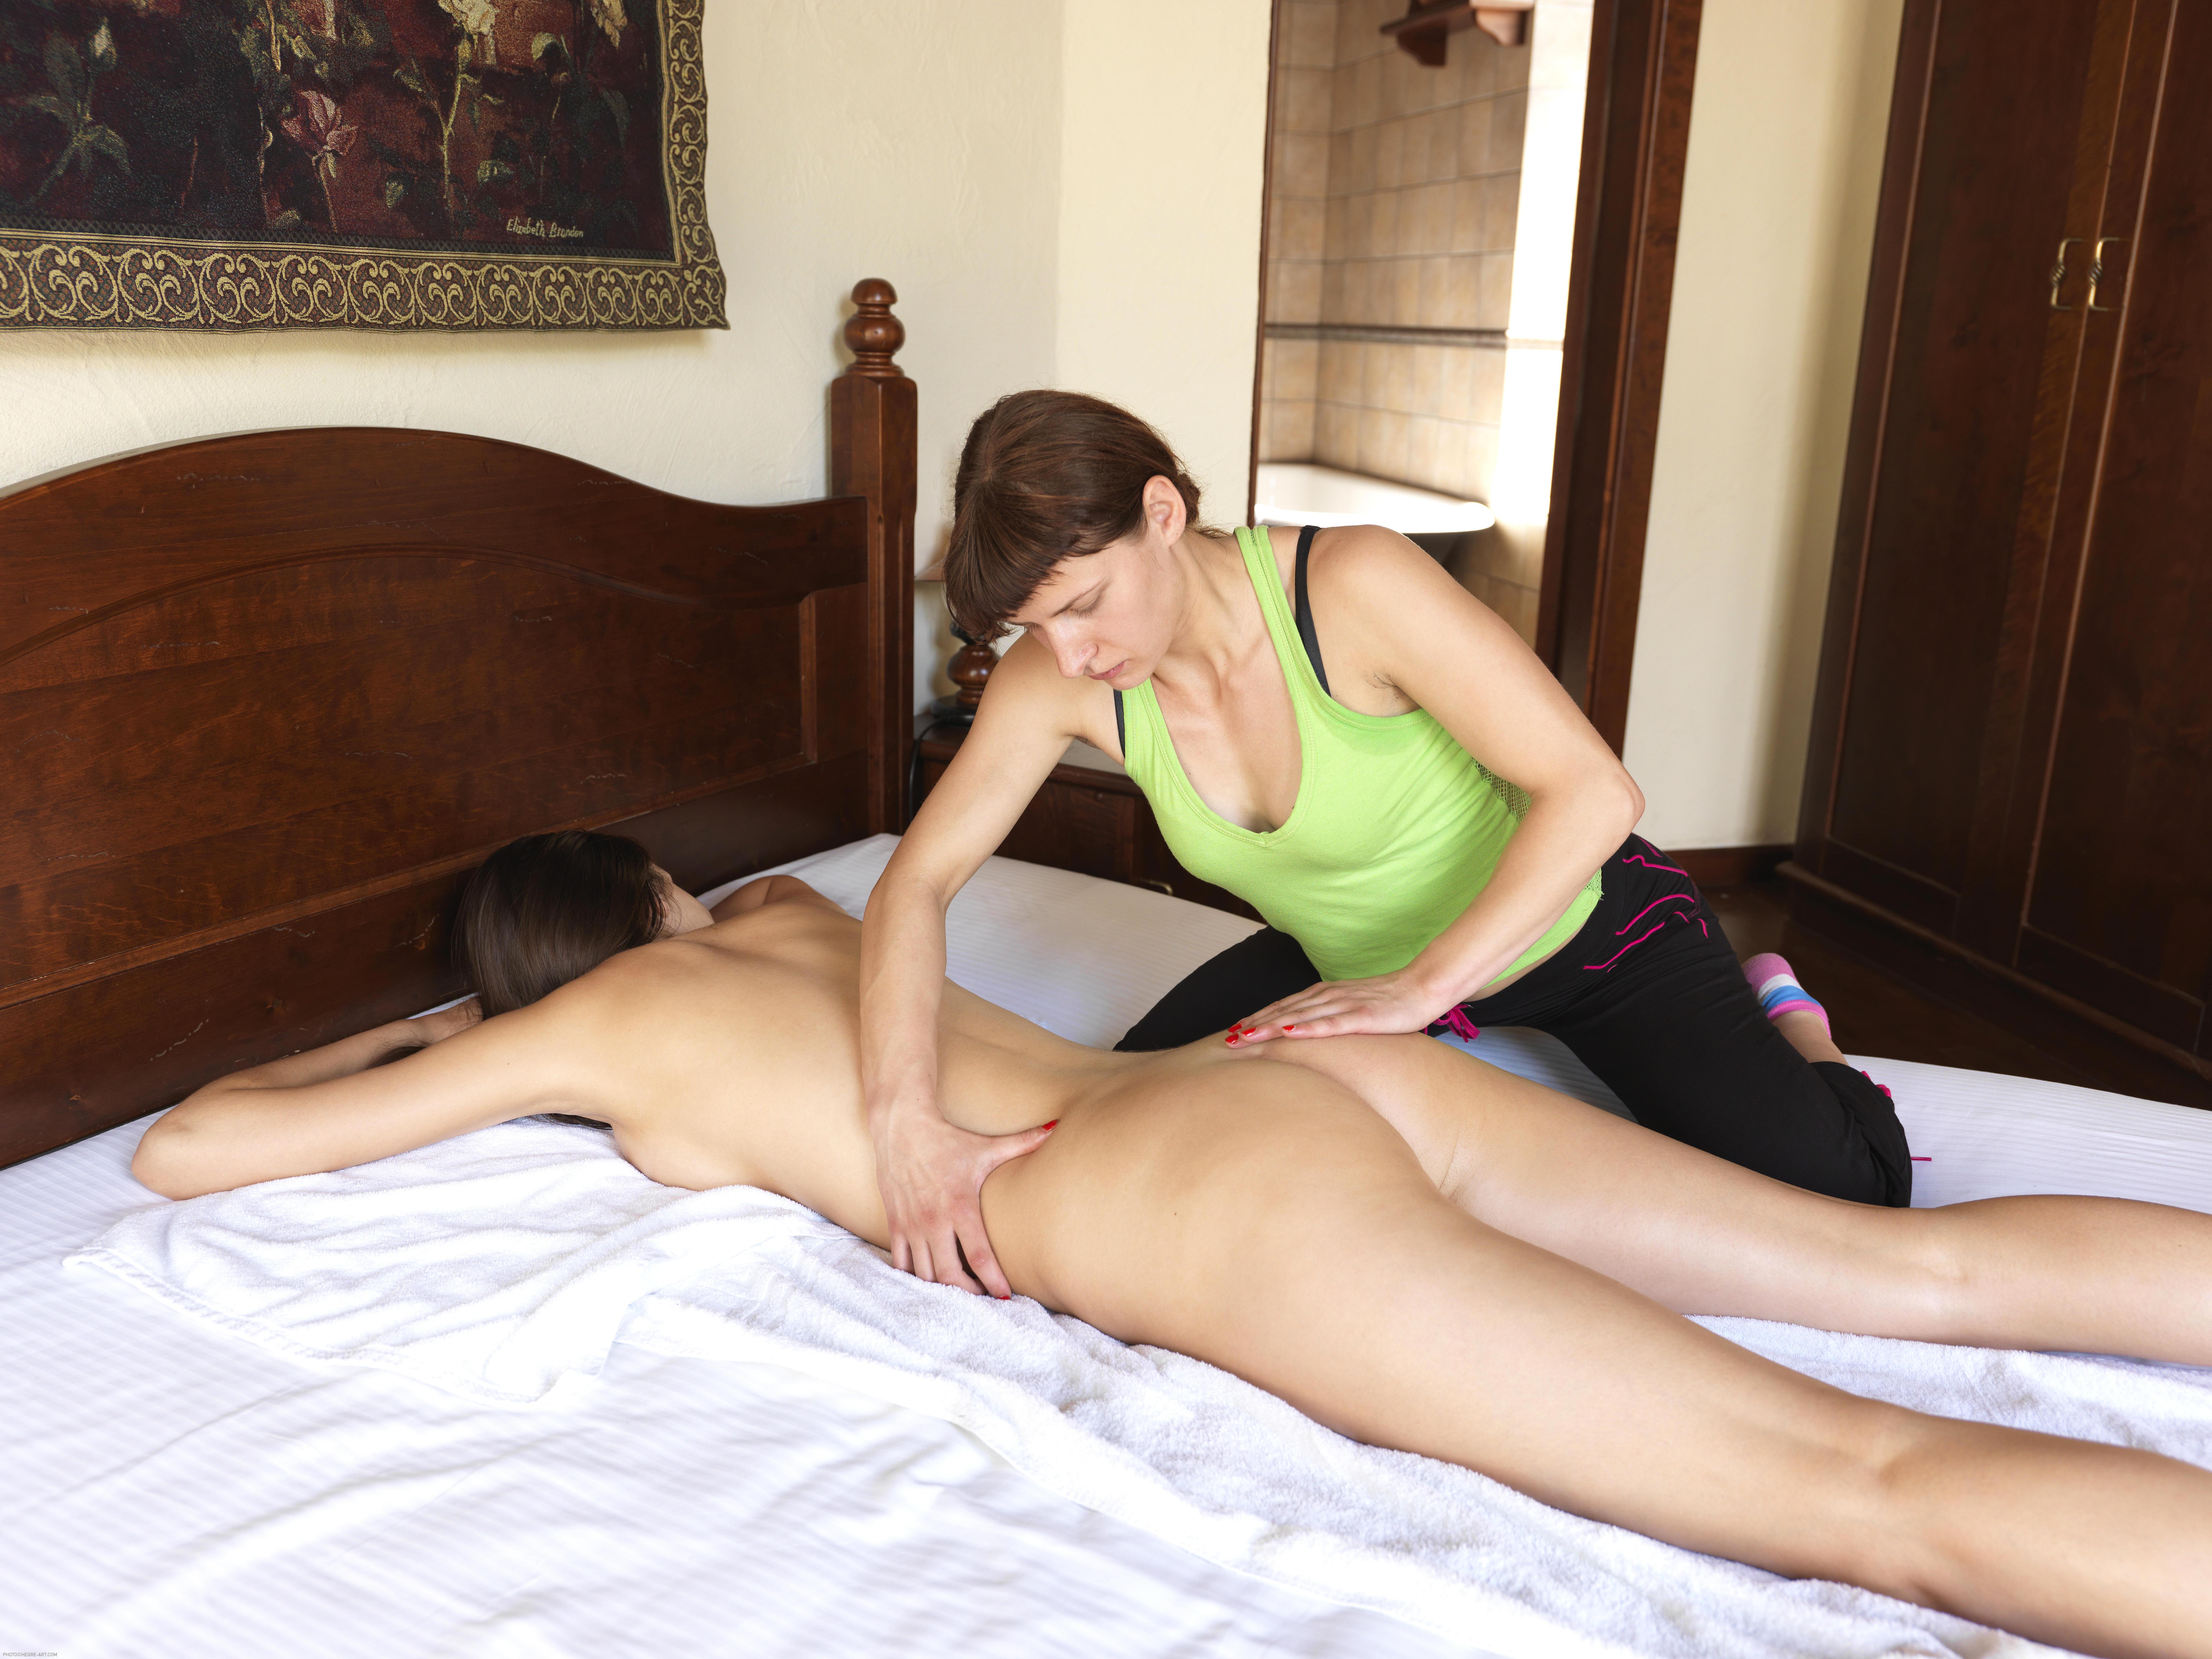 erotic massage in scotland adult forum co nz